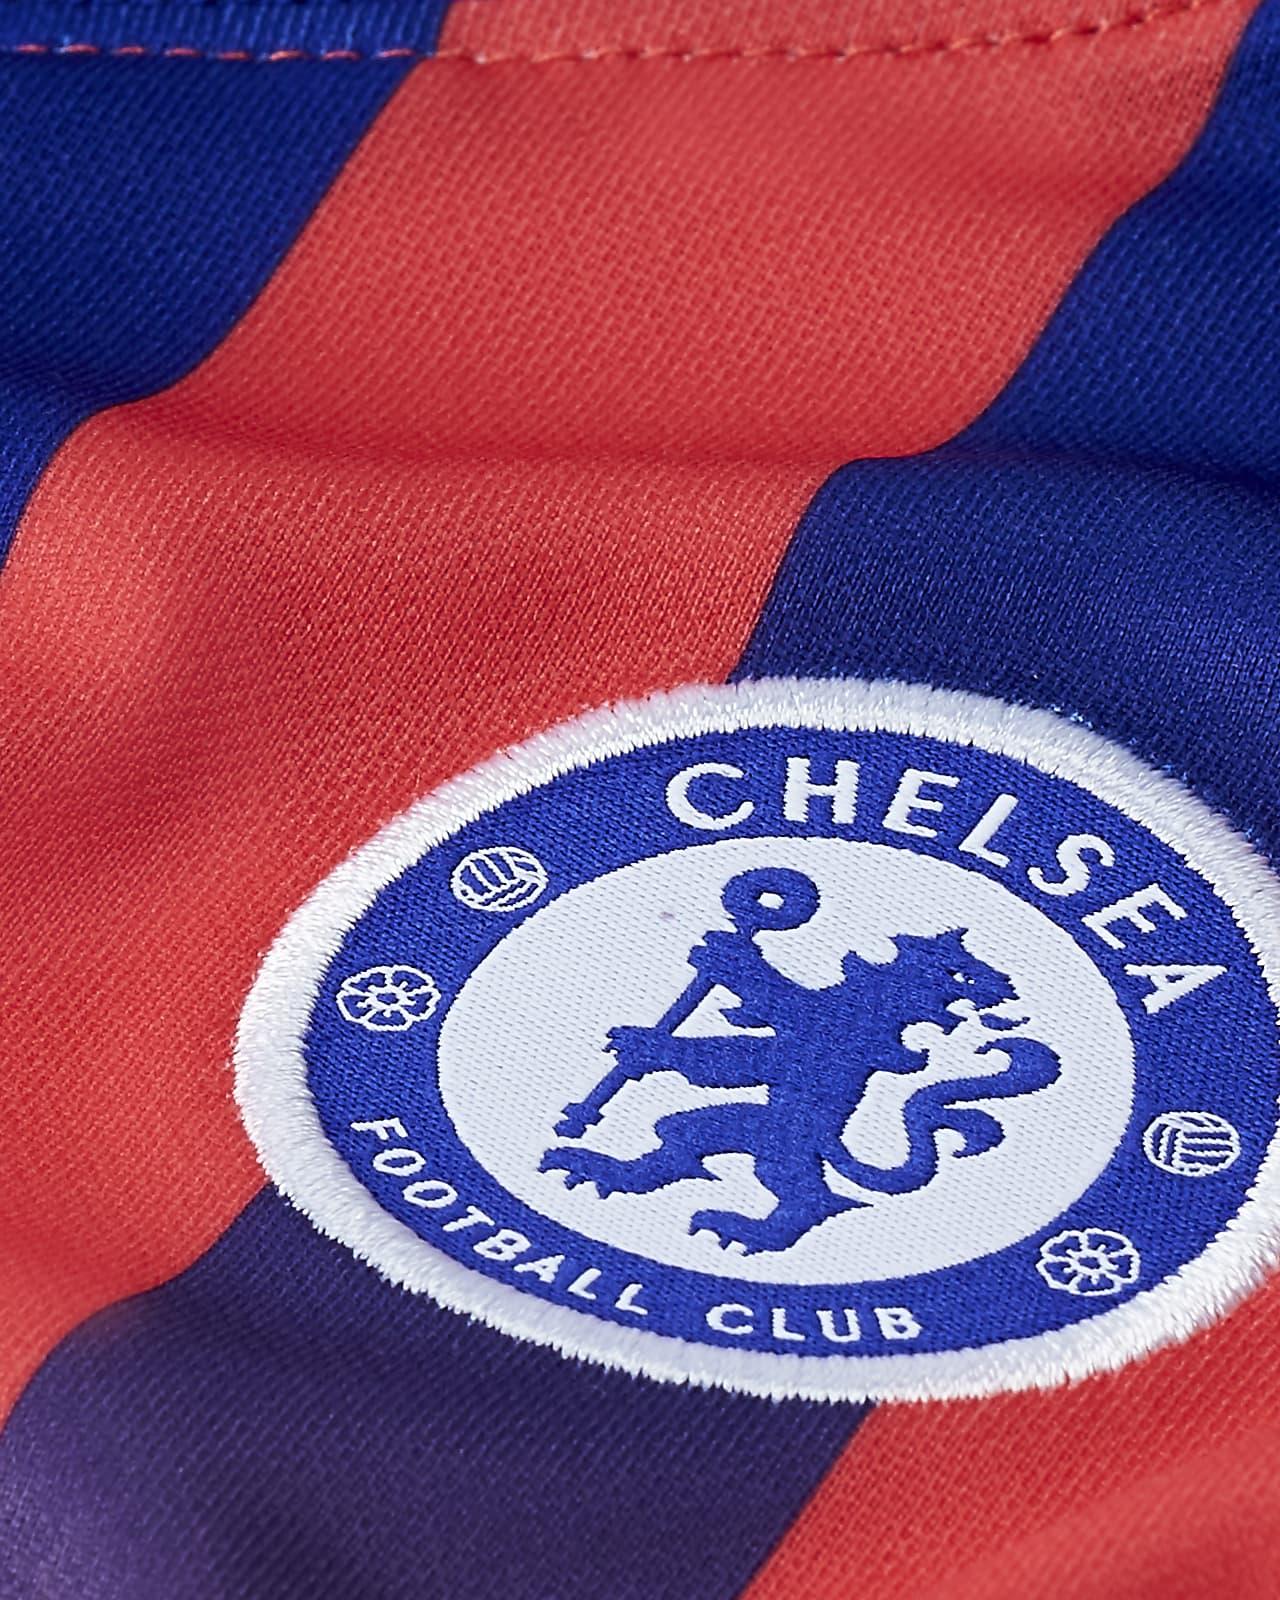 Chelsea Fc : Chelsea Fc Stadium Tours Sporttour ...